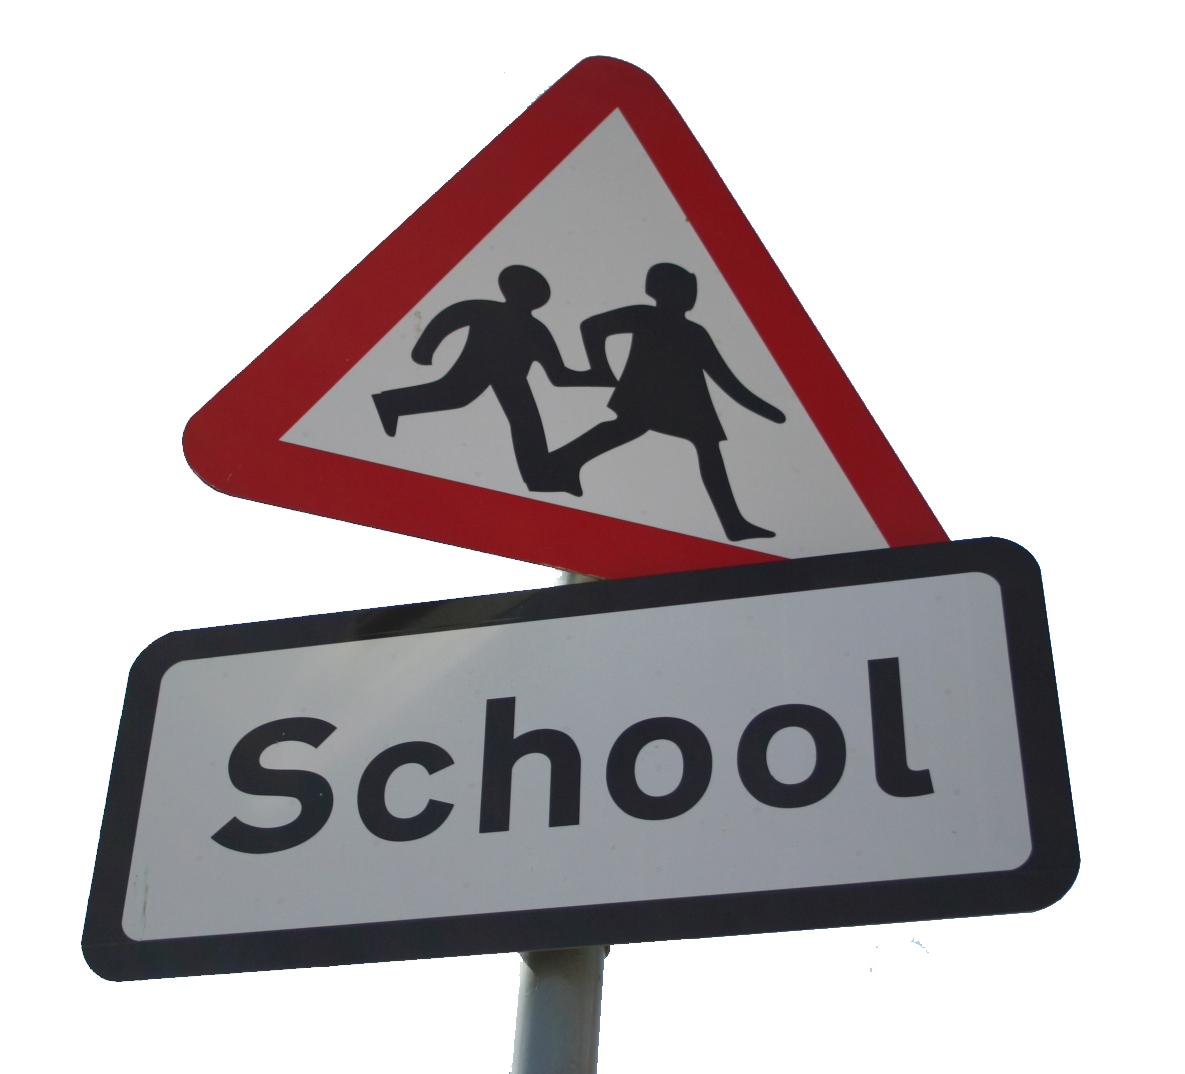 school-sign.jpg